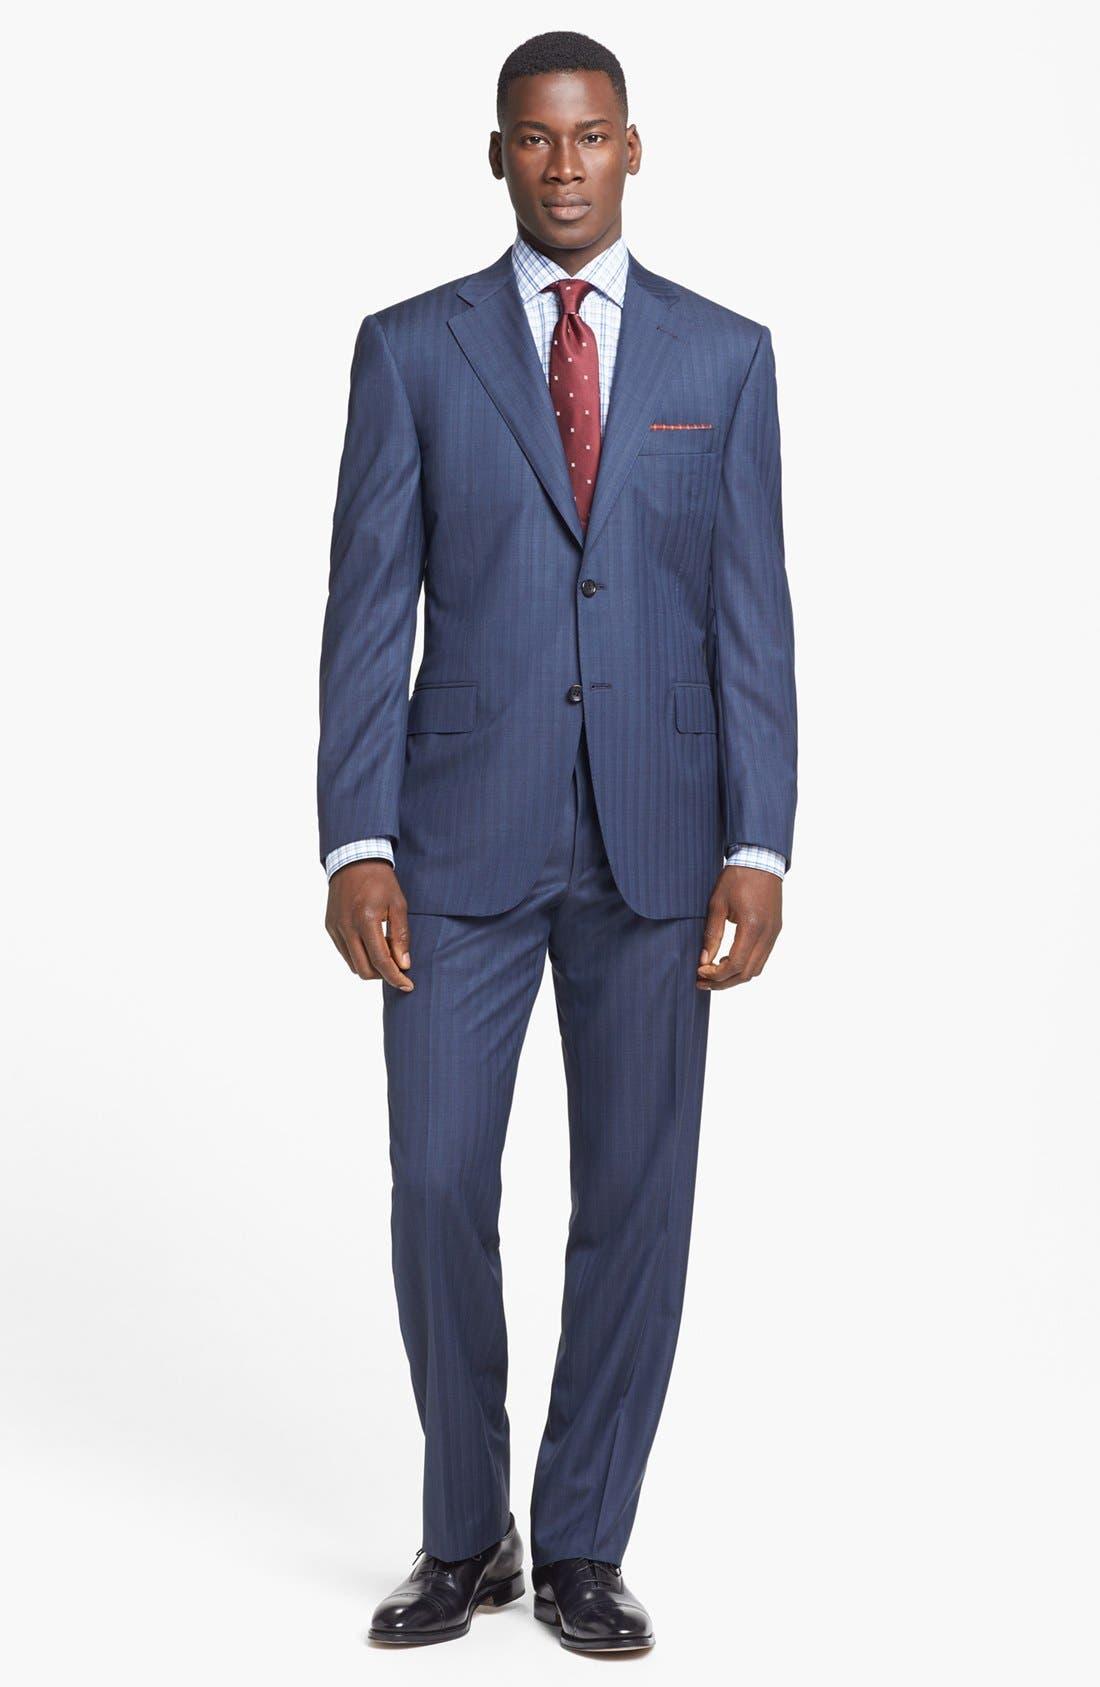 Main Image - Canali Suit & BOSS HUGO BOSS Dress Shirt